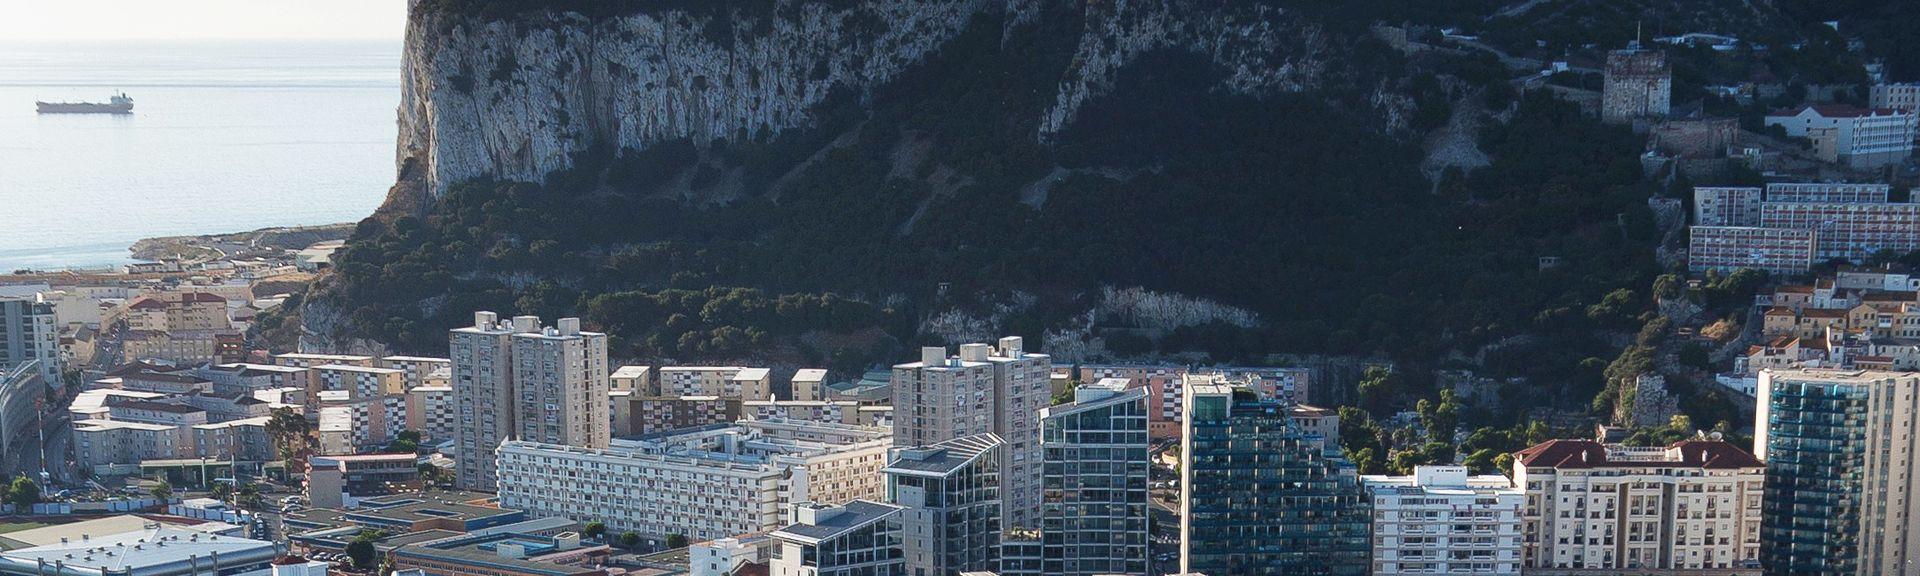 Place des Casemates, Gibraltar, Gibraltar